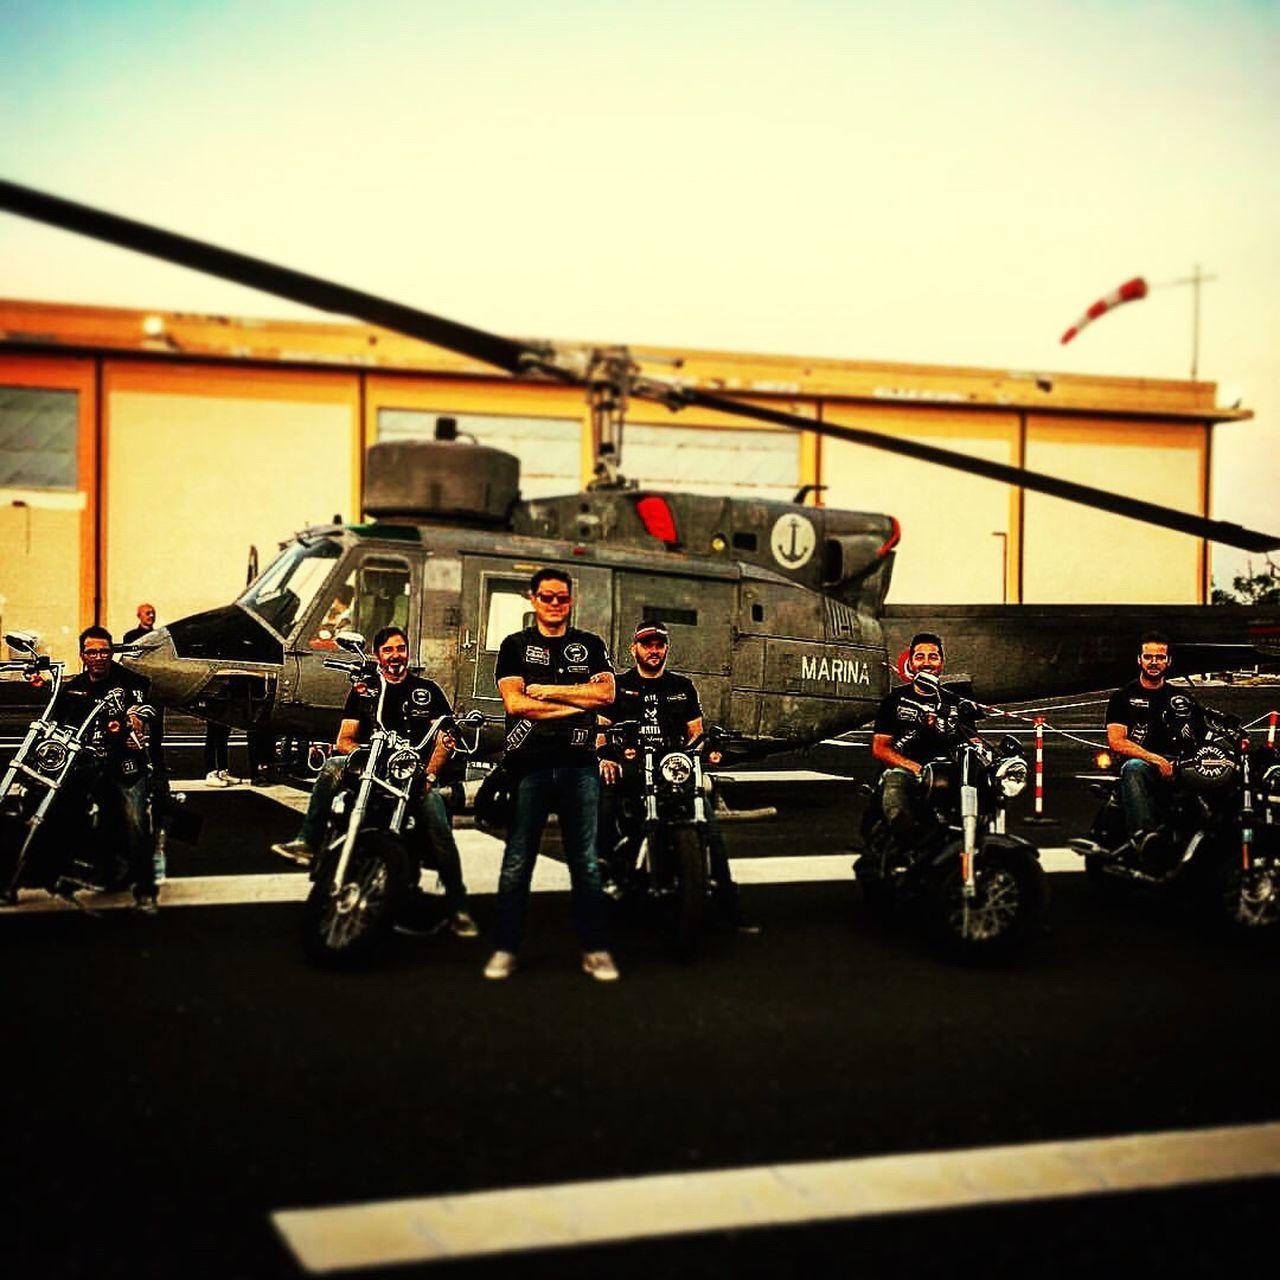 Harley Davidson Punishers Law Enforcement Brotherood Motorcycle Club First Eyeem Photo